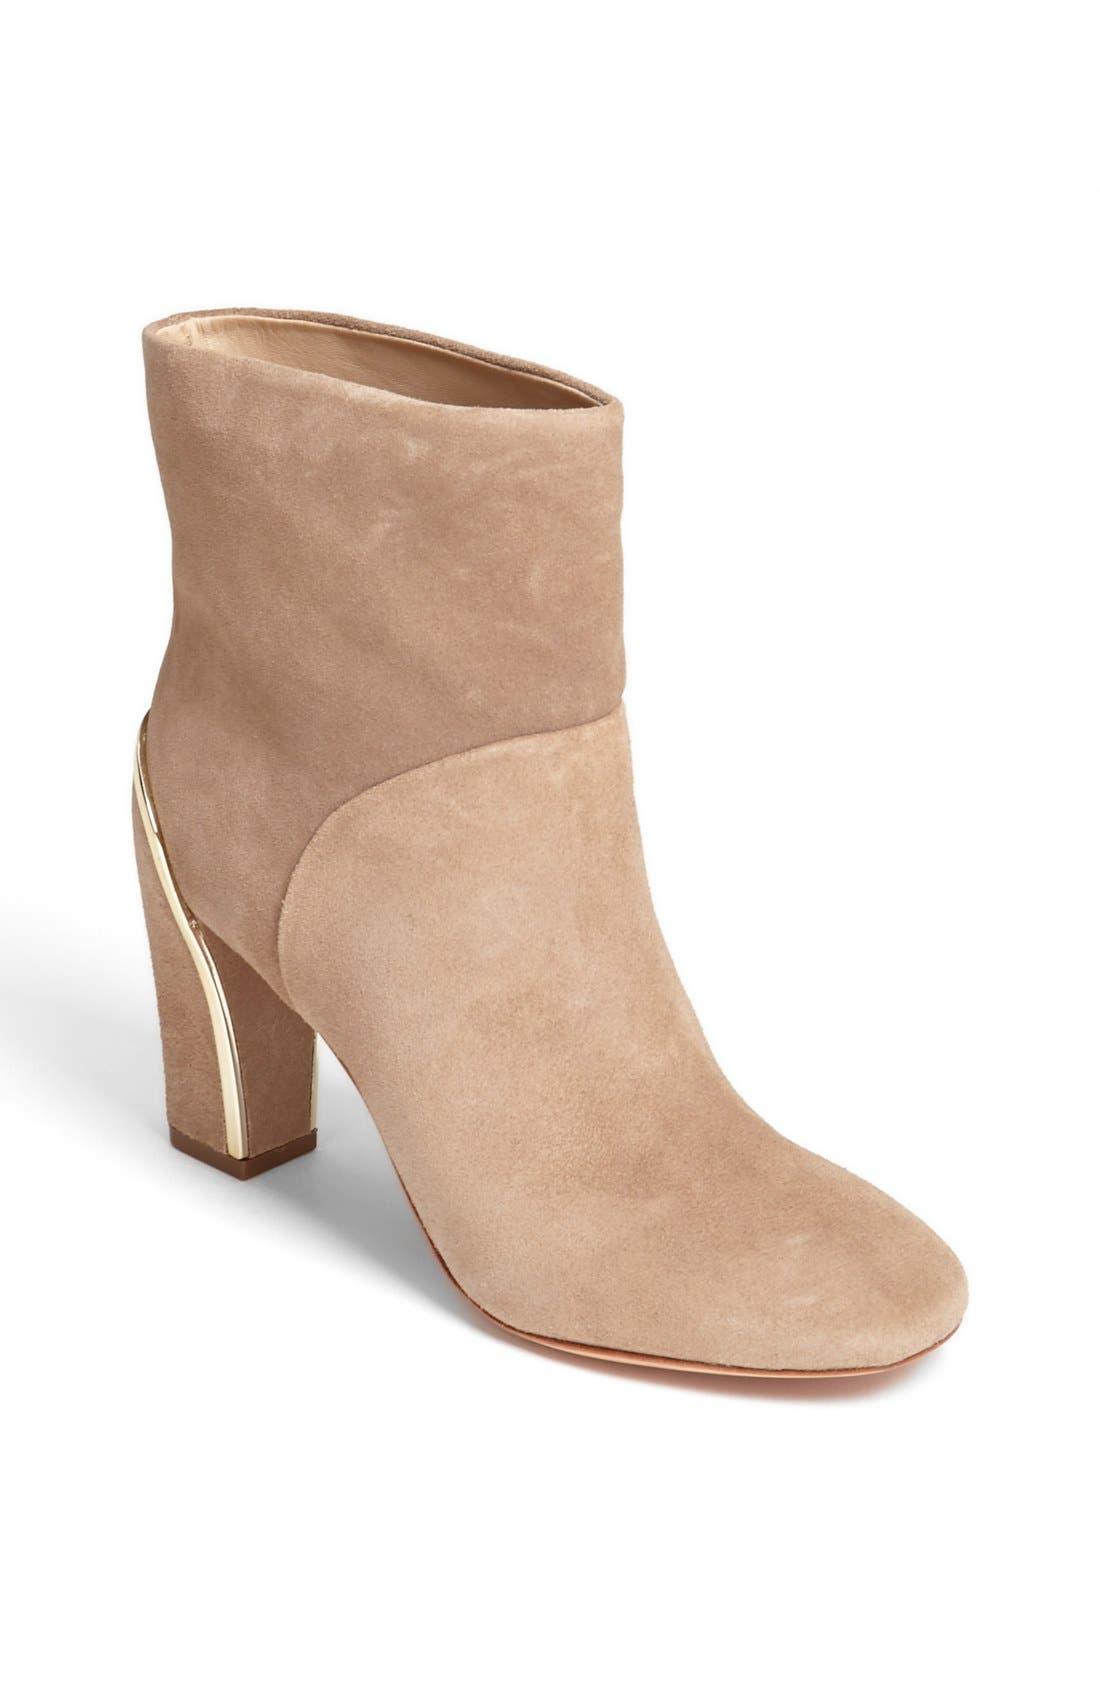 Alternate Image 1 Selected - Diane von Furstenberg 'Glenda' Boot (Online Only)